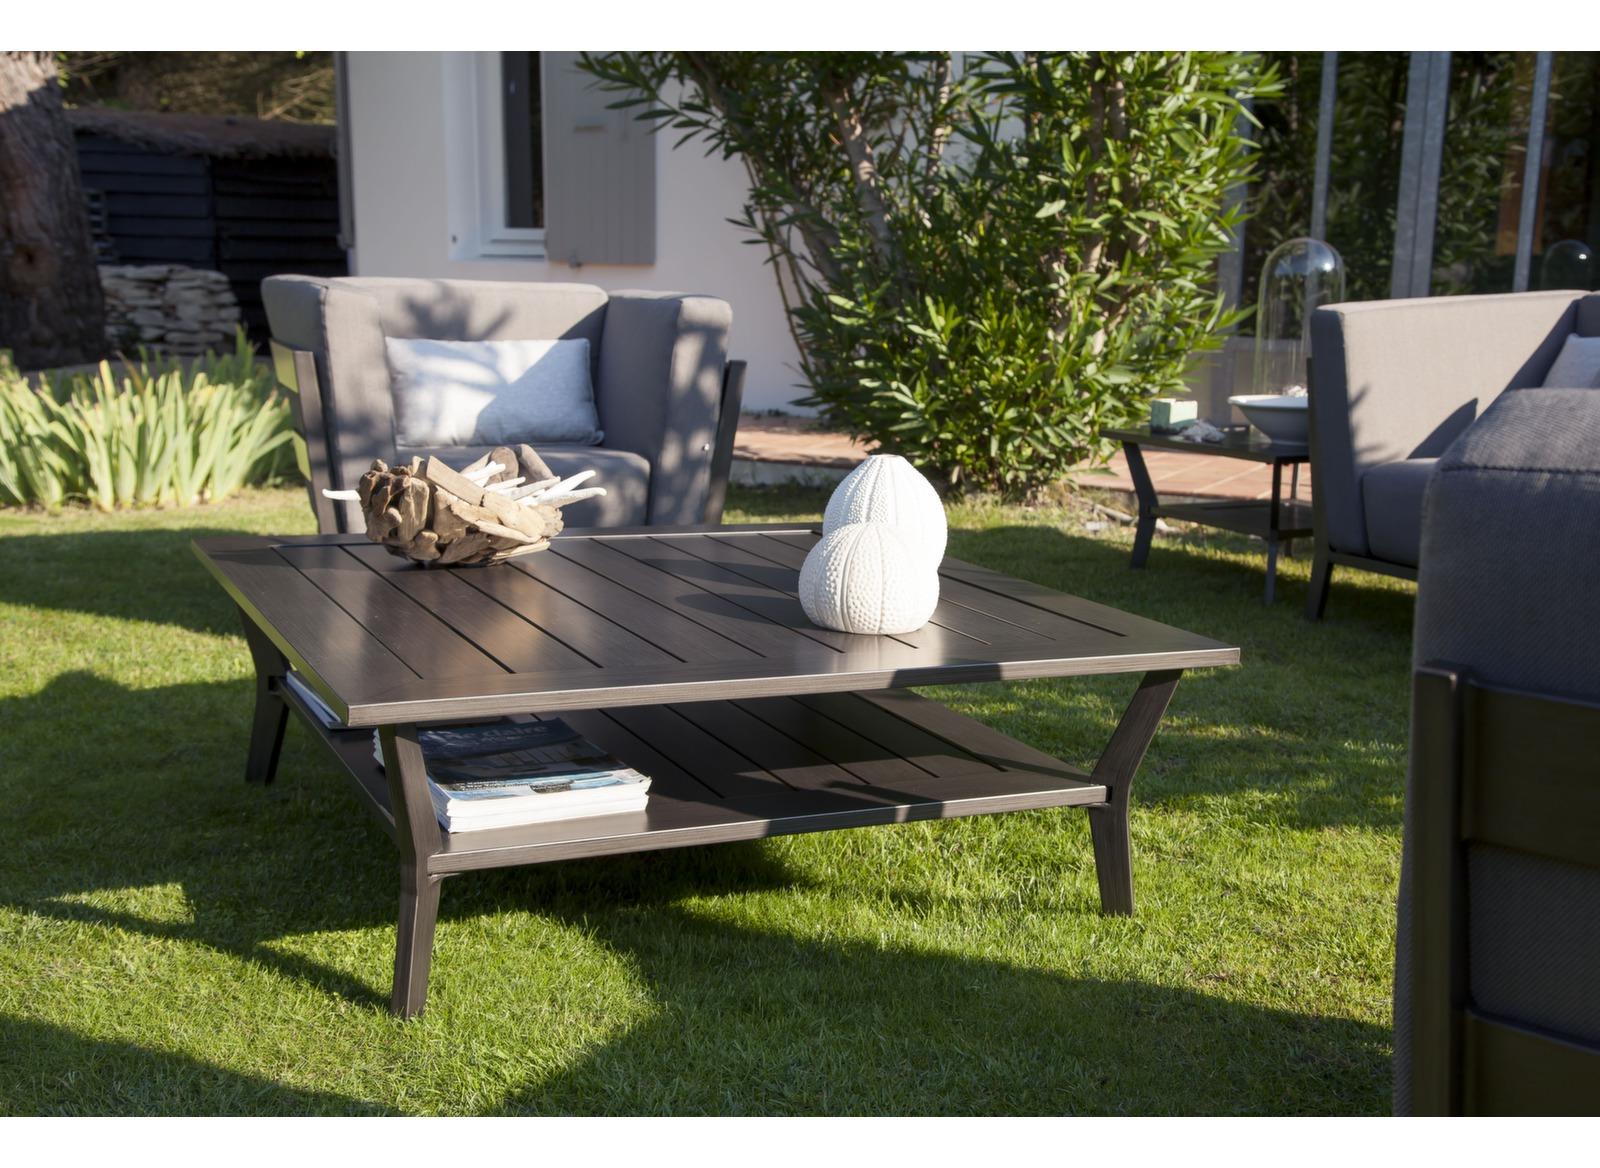 Table basse de jardin 2 niveaux aluminium 105cm sofa oc o for Jardin 2 niveaux